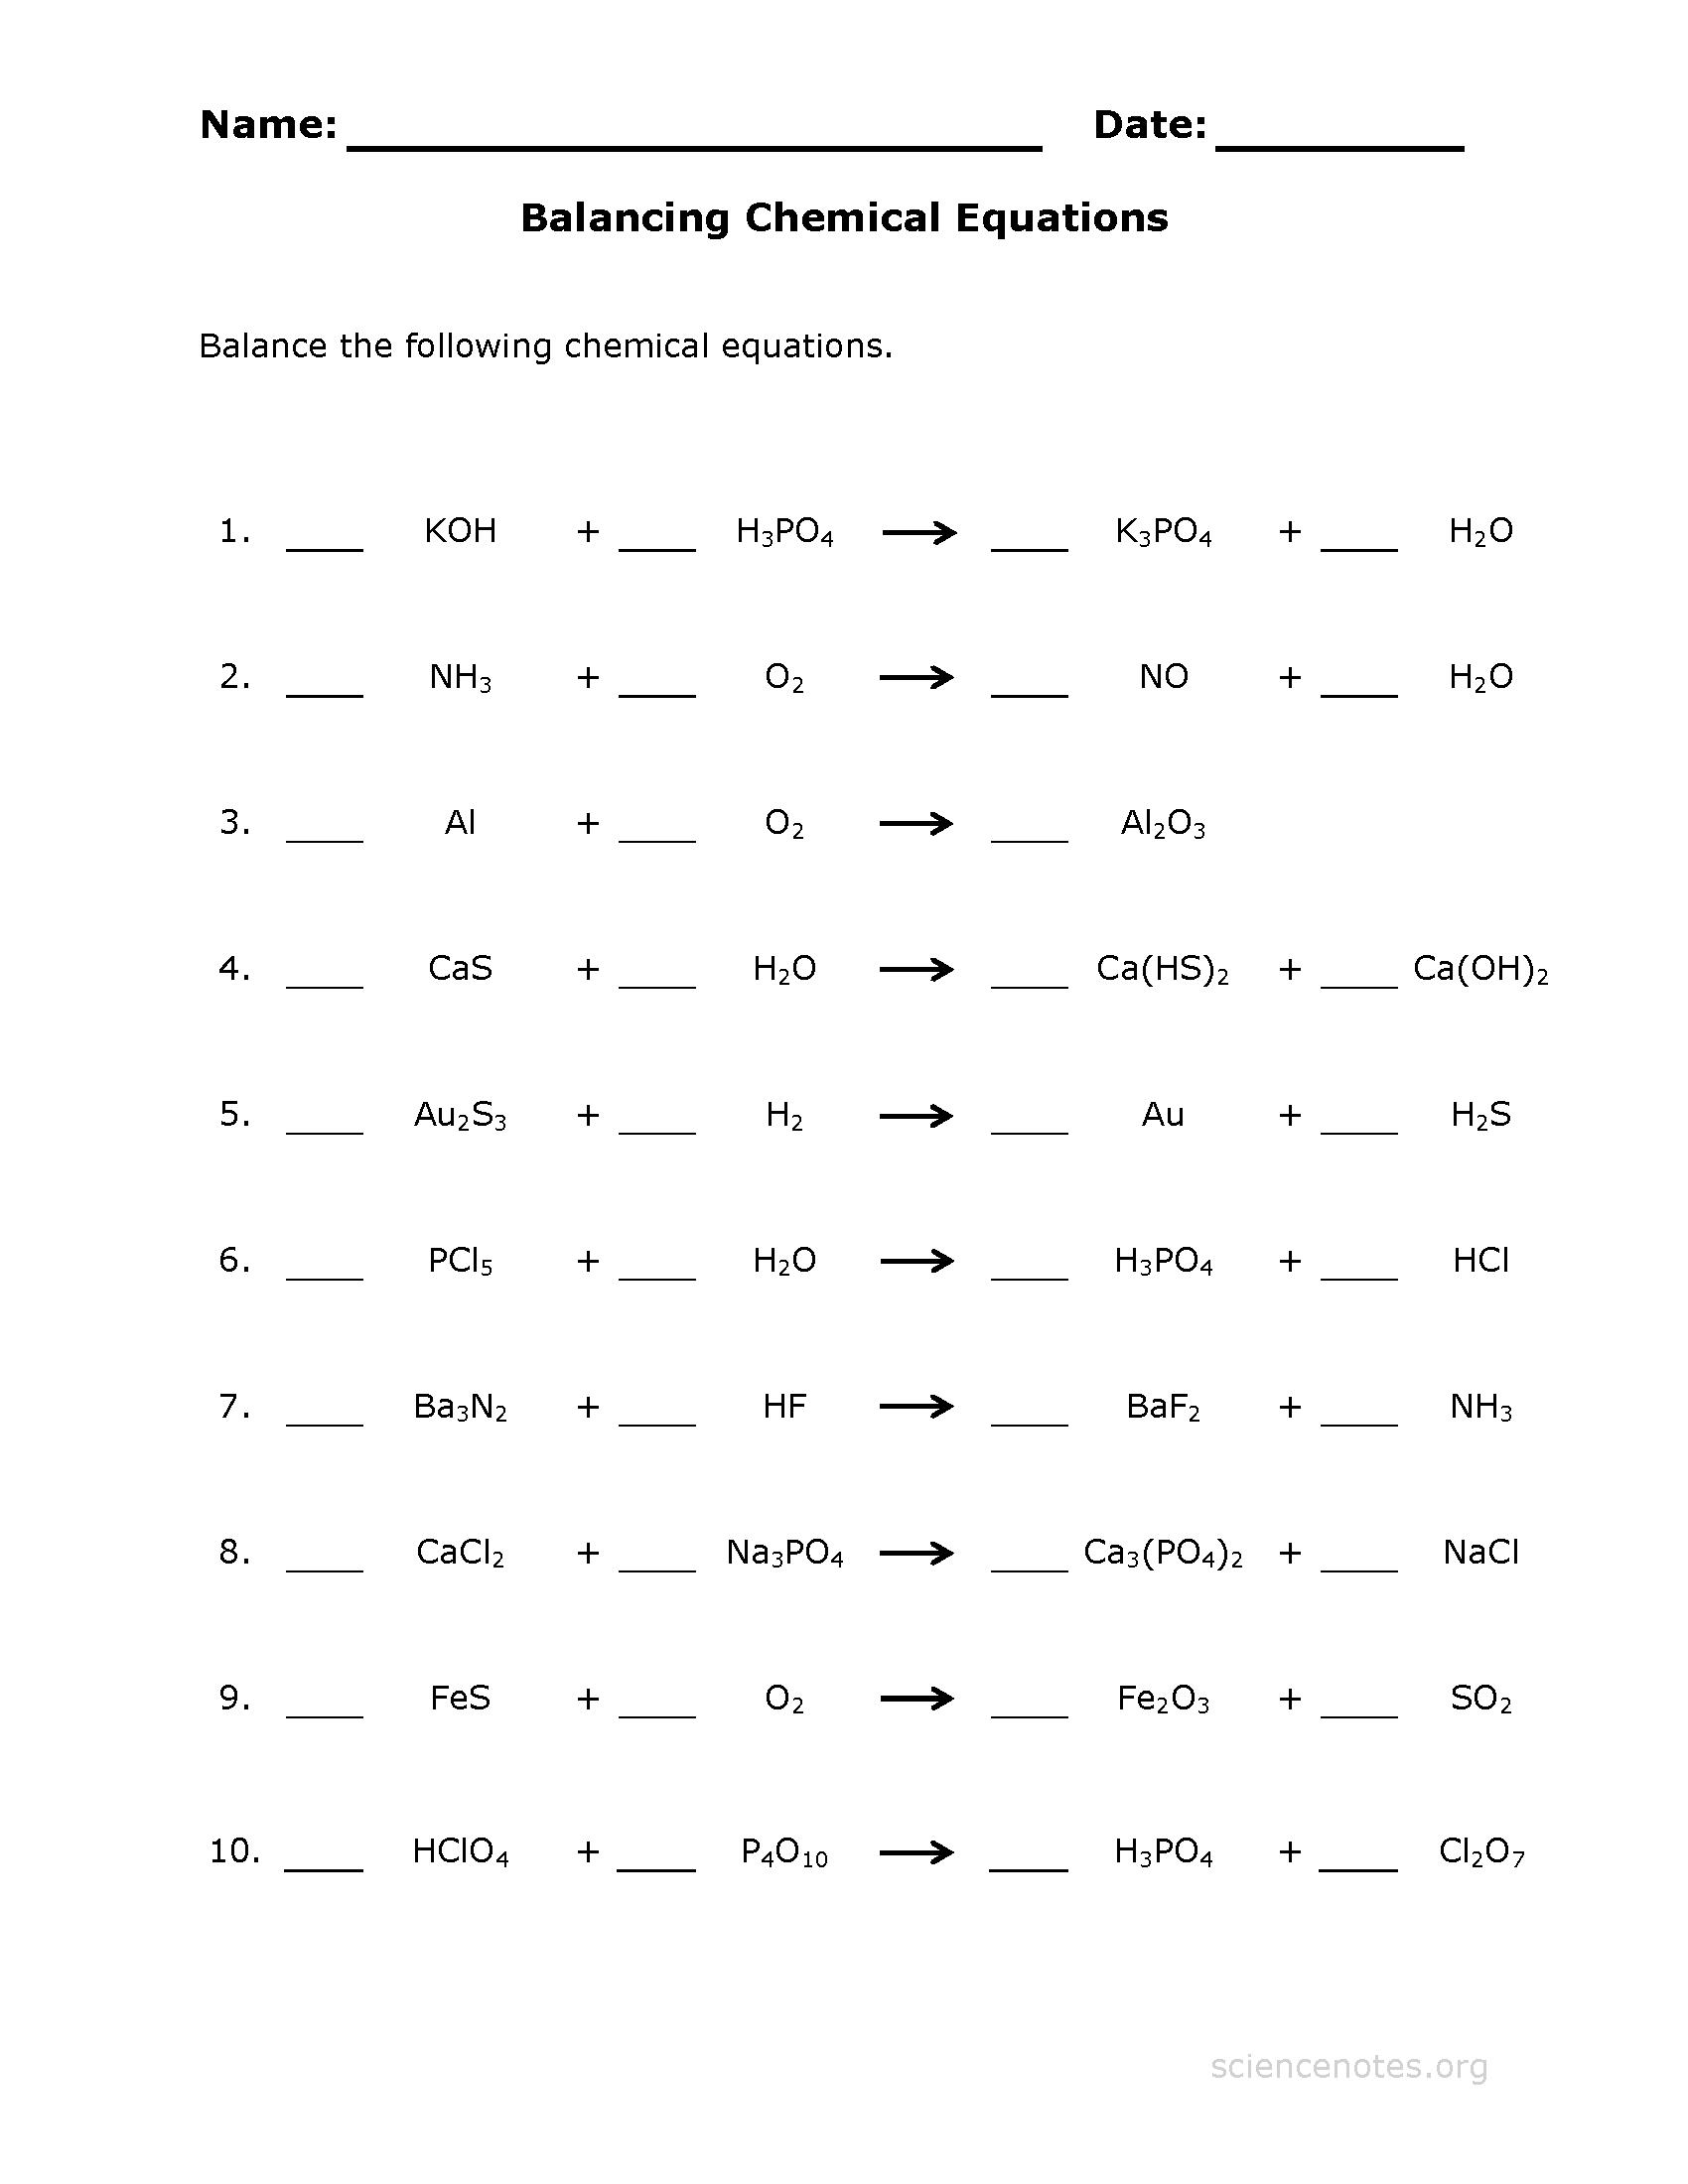 Balancing Chemical Equations Practice Sheet Intended For Balancing Chemical Equations Worksheet Grade 10